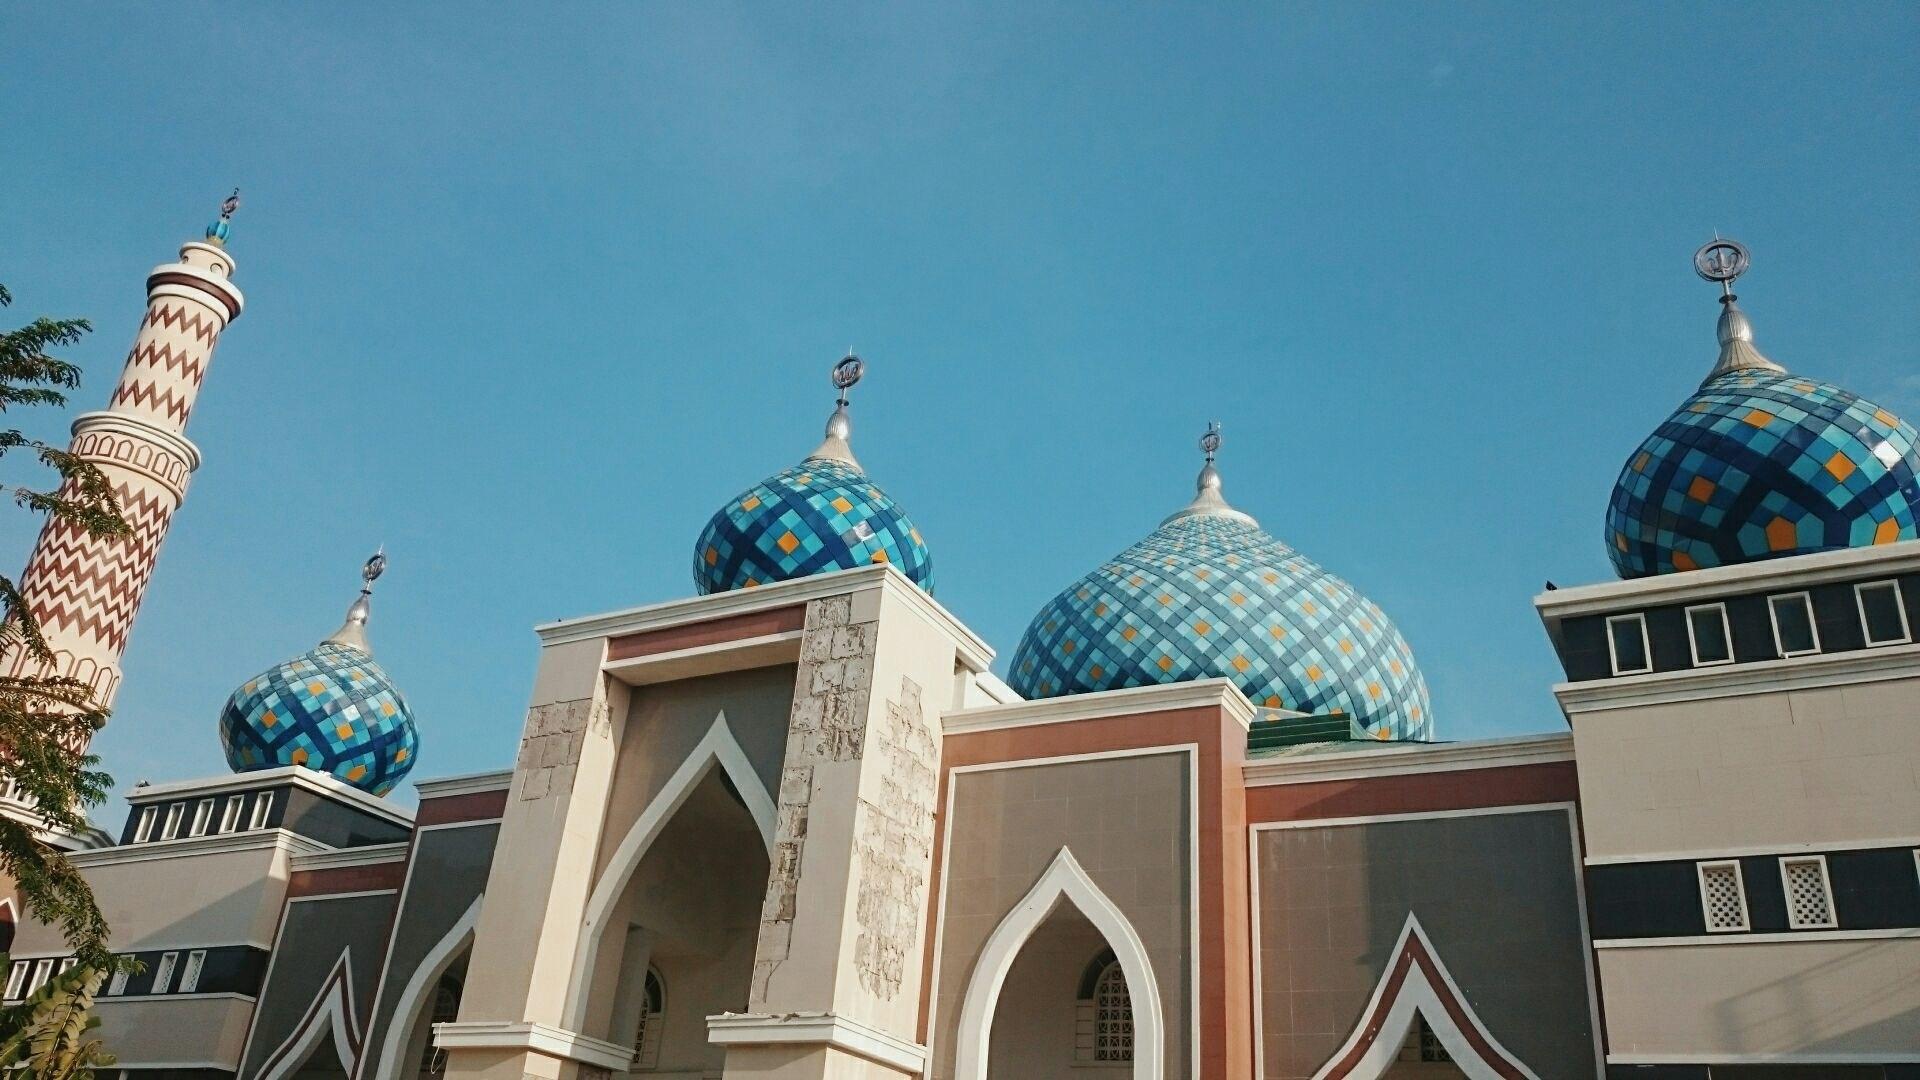 Gallery Page 7 Membuka Ruang Masjid Raya Nurussa Adah Kupang